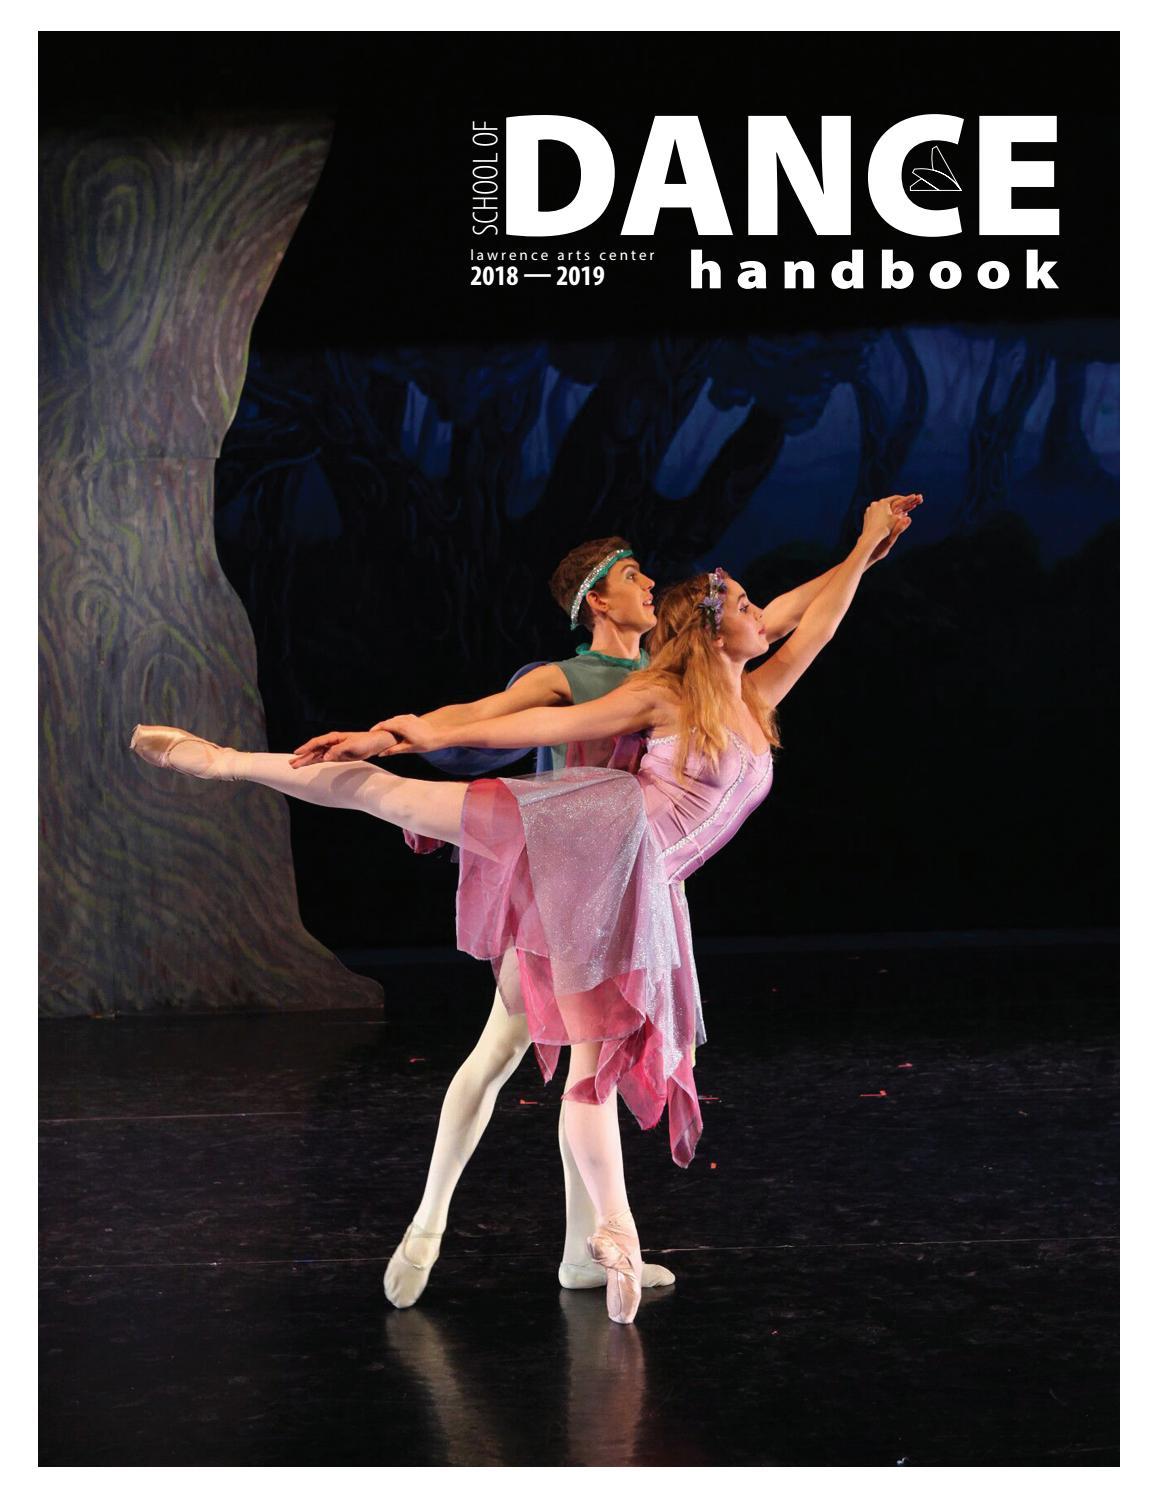 Lawrence Arts Center School of Dance Handbook 2018/19 by